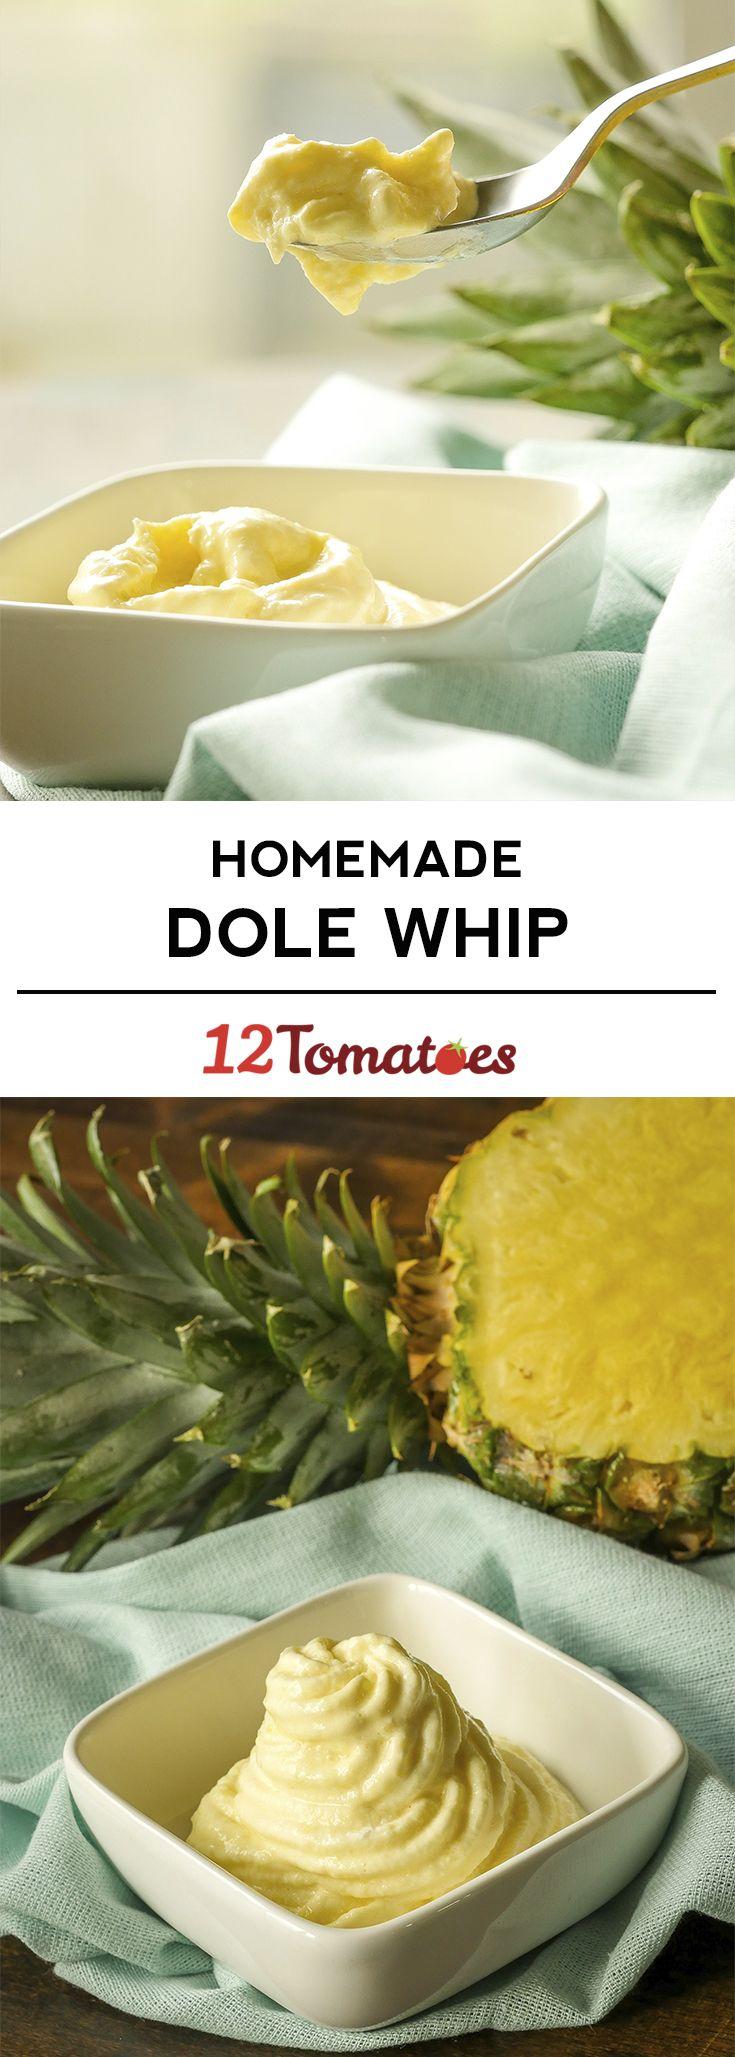 Homemade Dole Whip